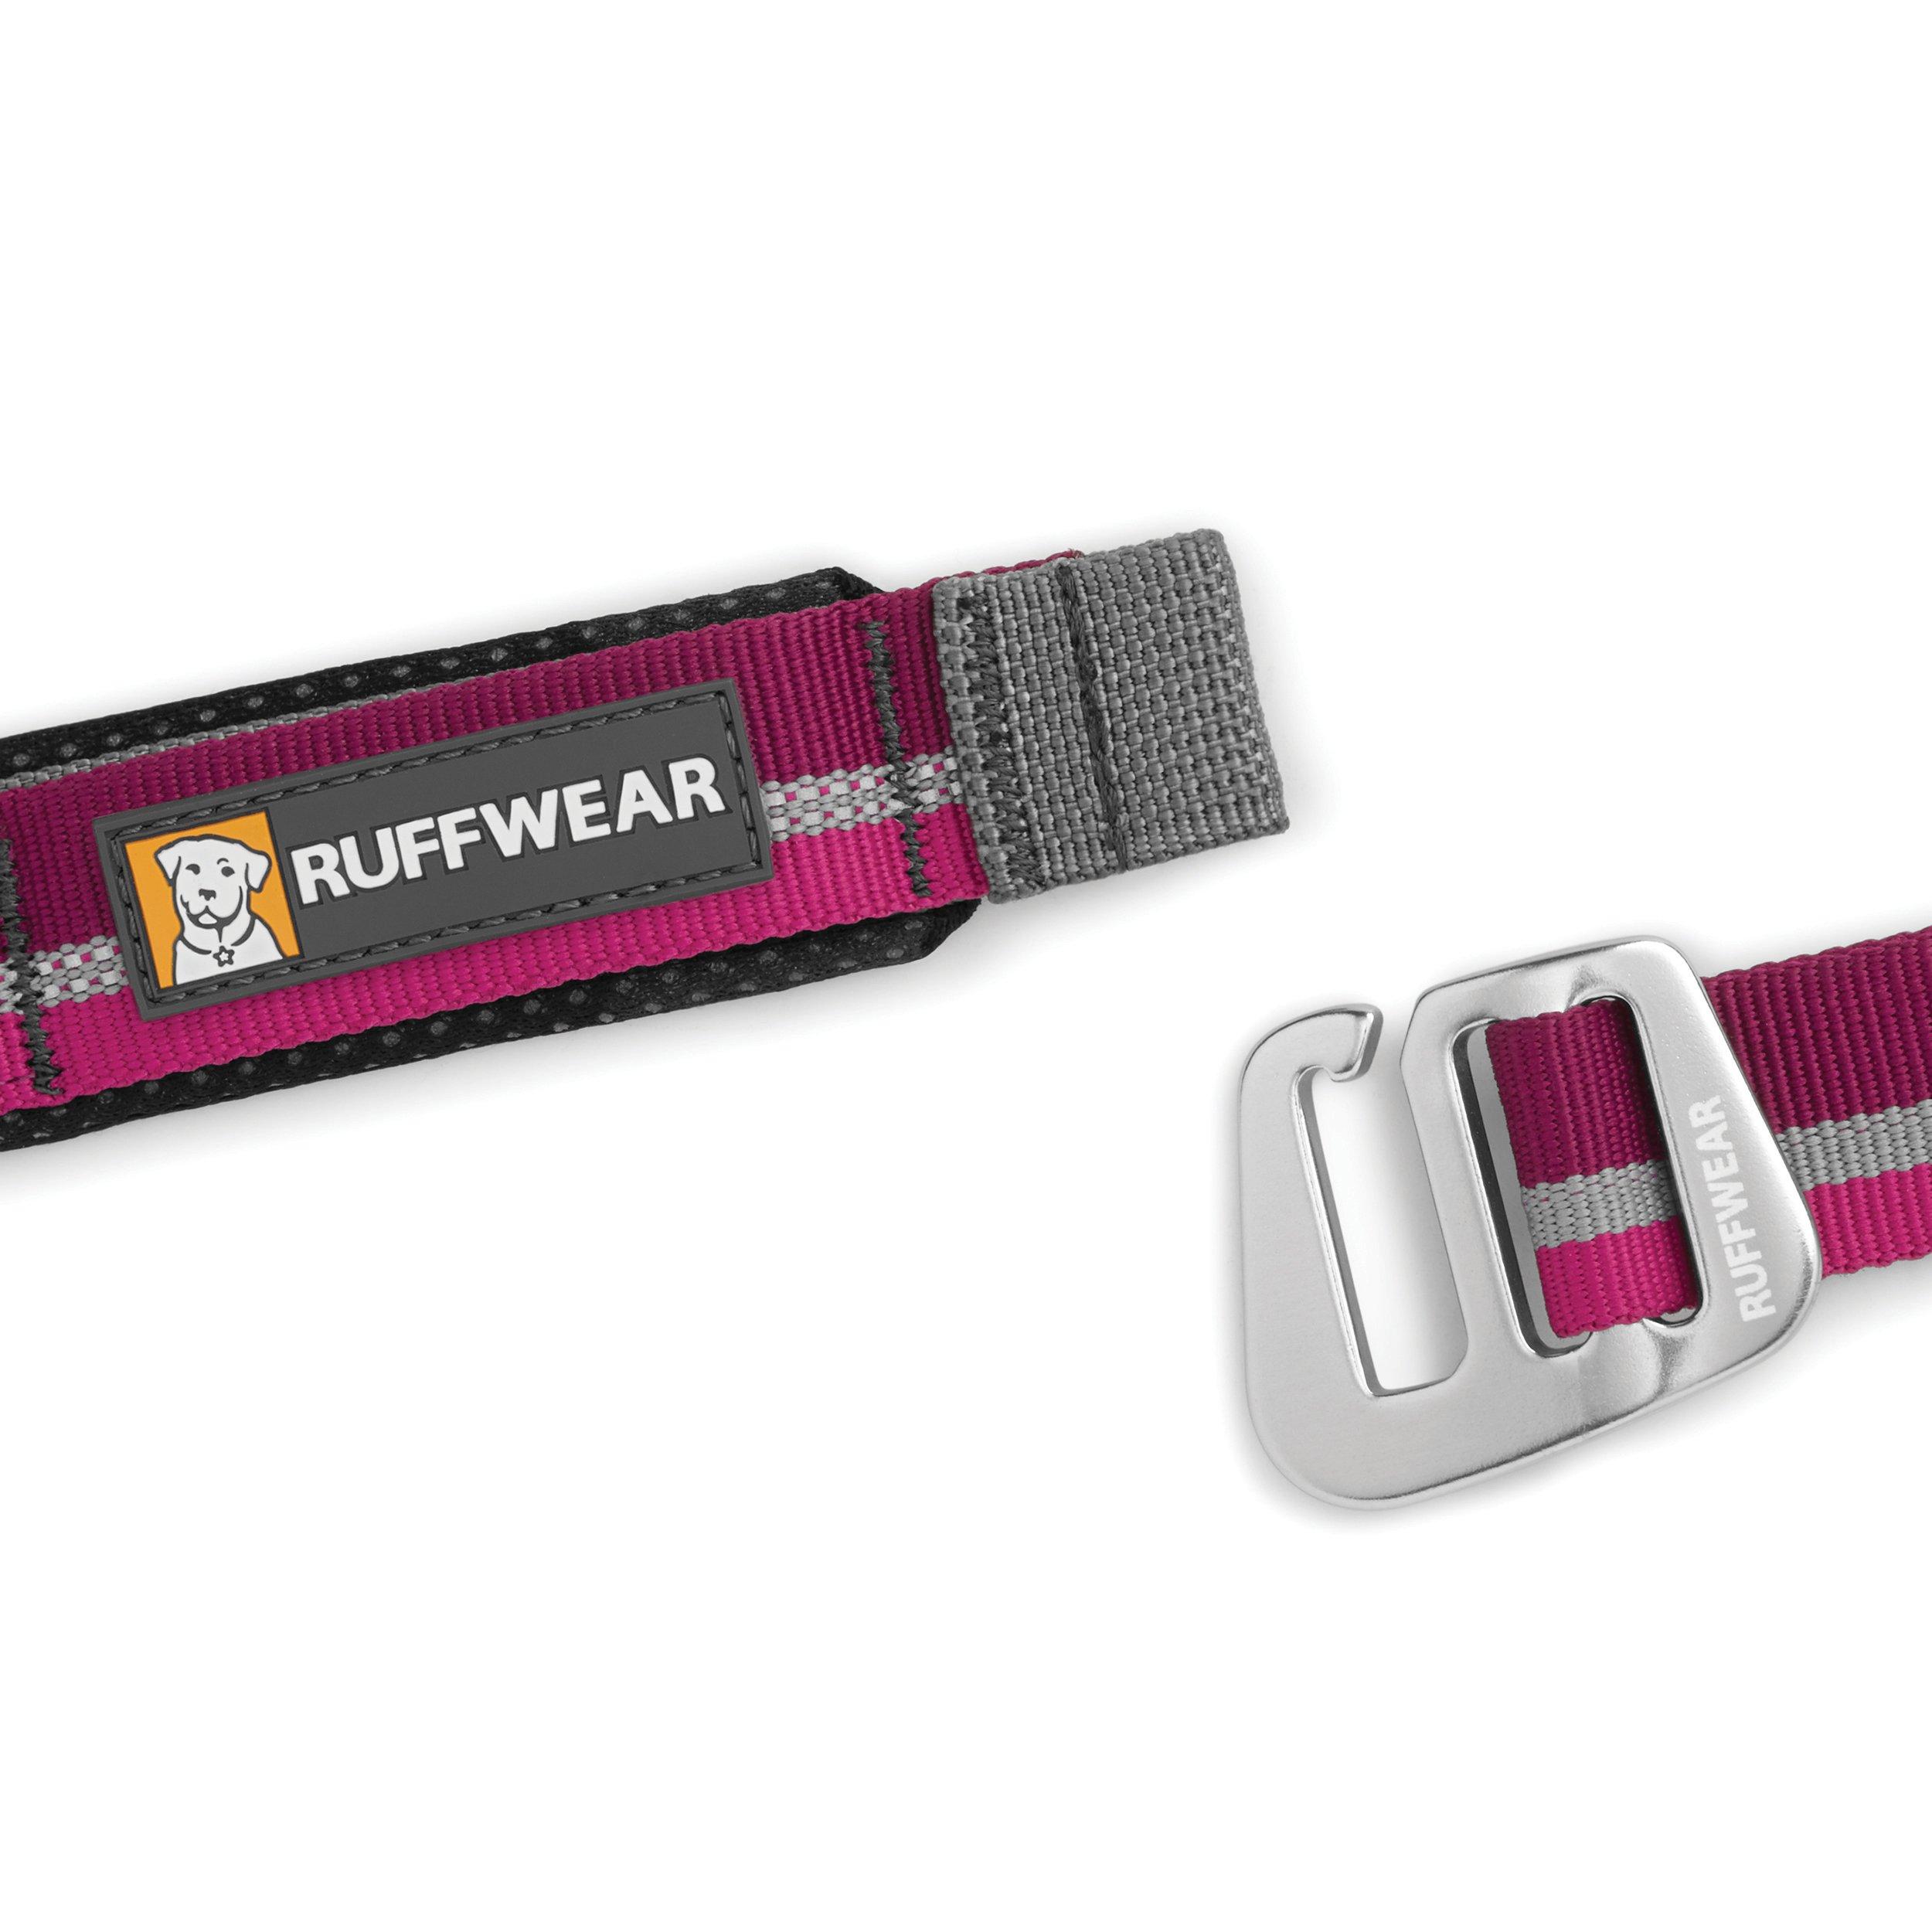 RUFFWEAR - Slackline Adjustable Length, Hand-Held or Waist-Worn Dog Leash, Purple Dusk